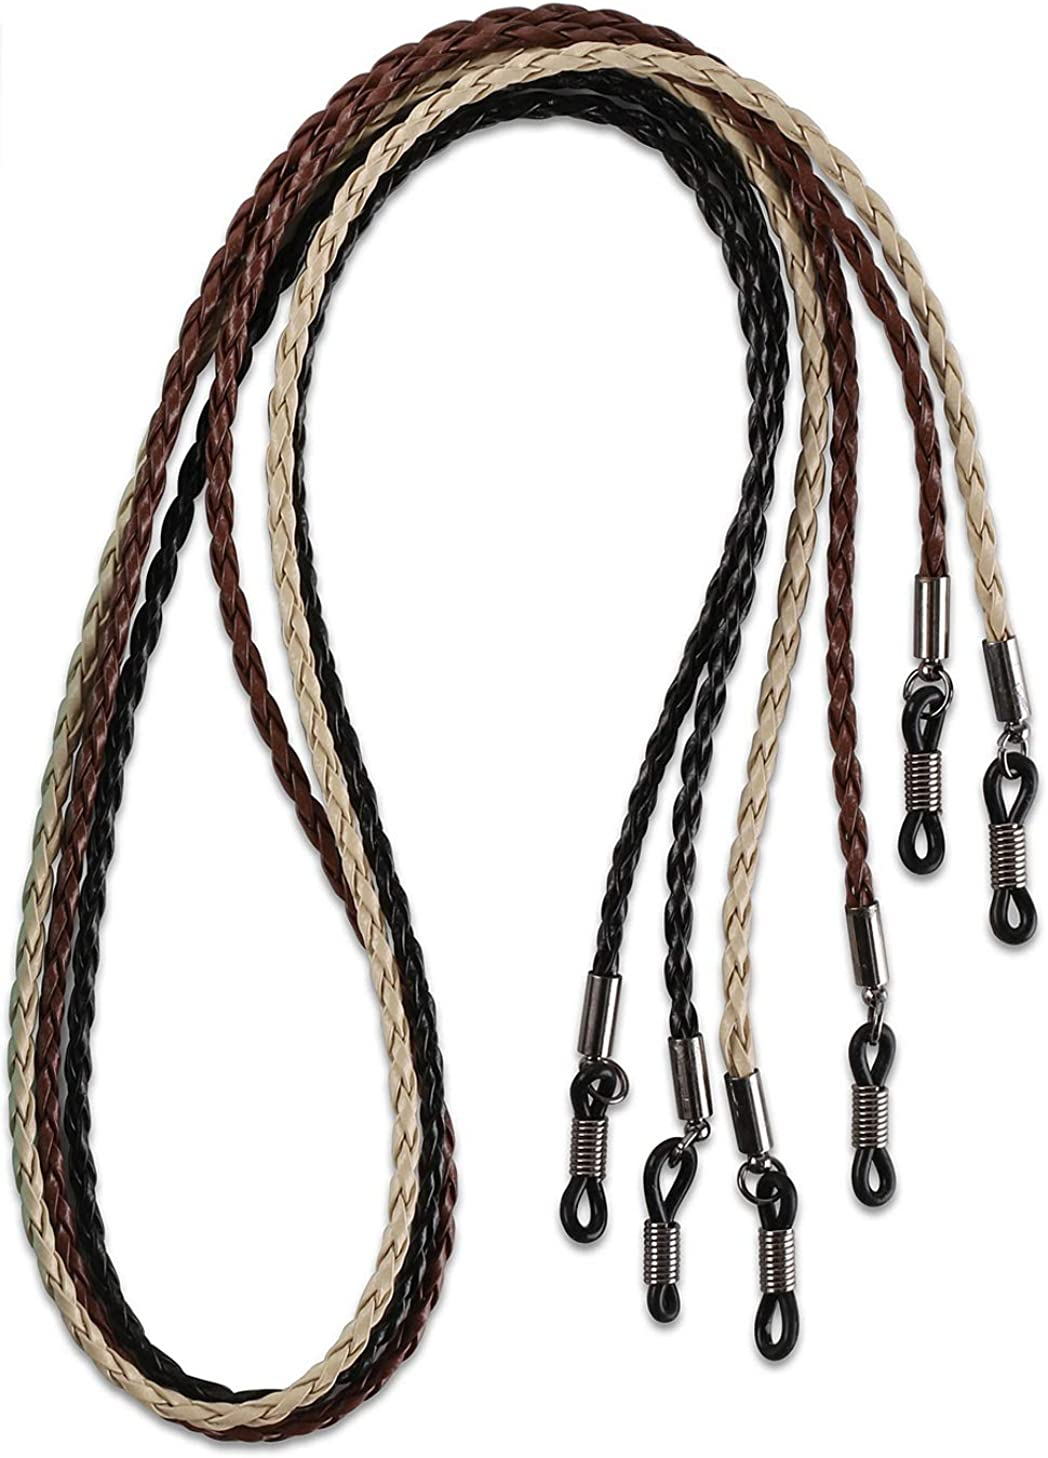 HANGIT Elegant Eyeglass Sunglass High order Retainer Braided Strap-Chain- Indefinitely